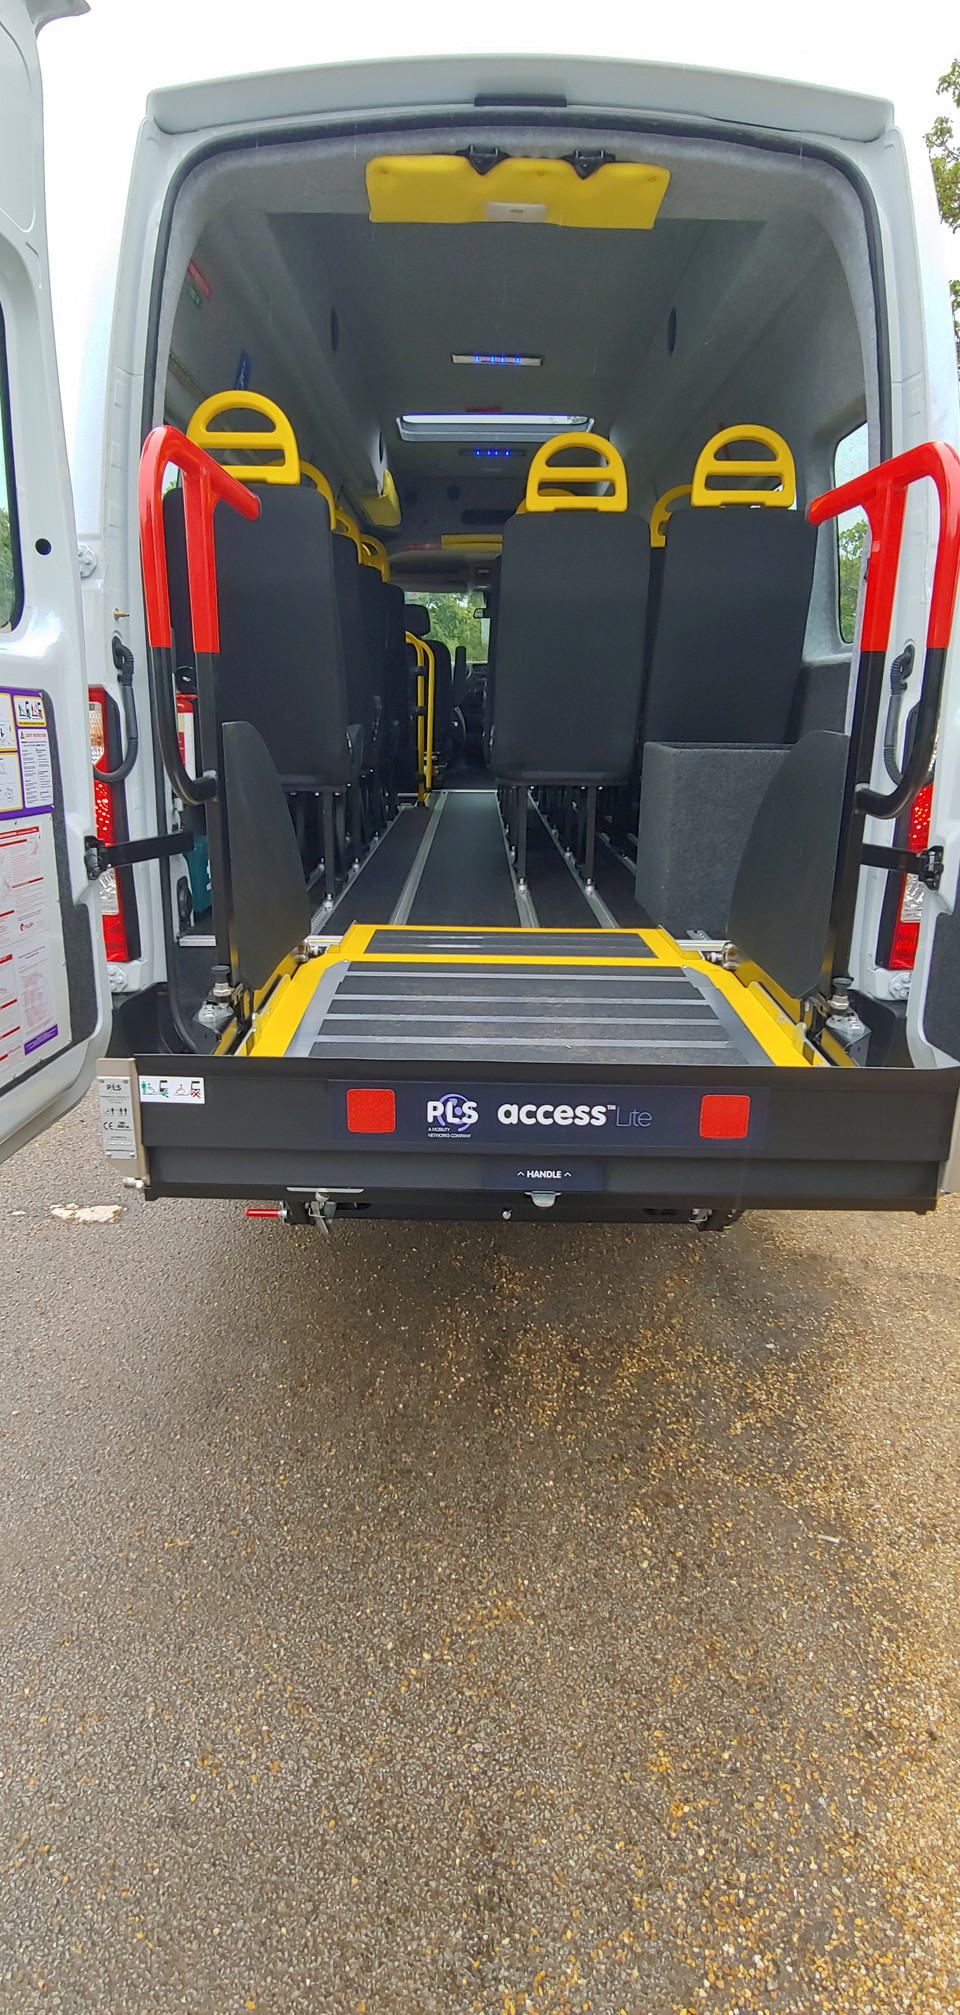 PLS Tail lift on Warnerbus conversion